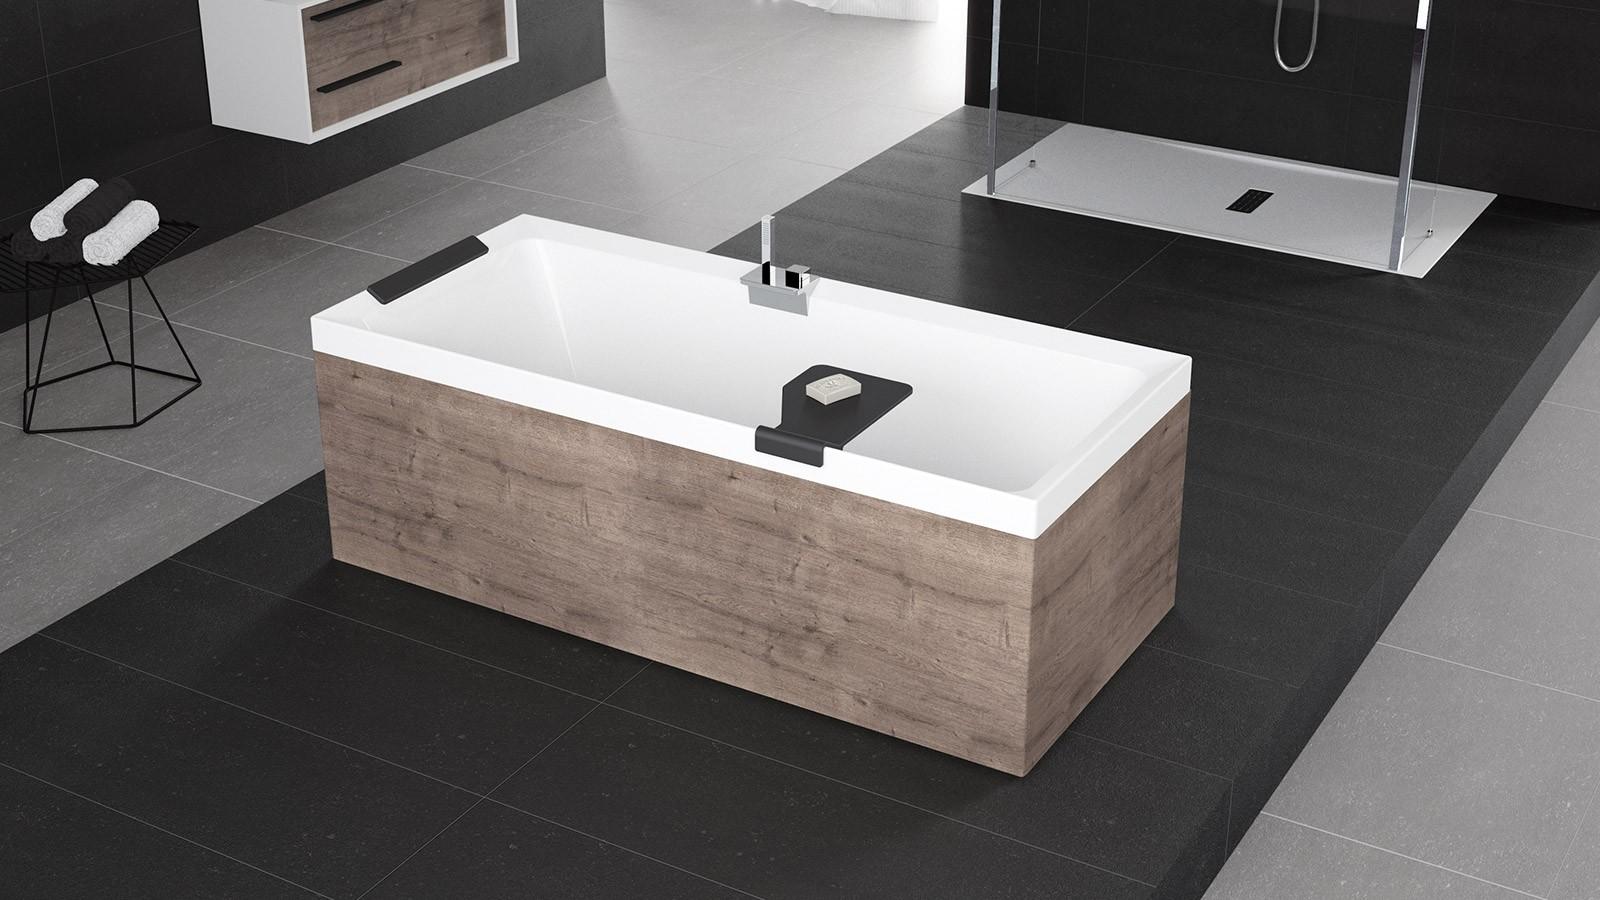 Vasca da bagno novellini diva standard sintesibagno network - Vasca da bagno standard ...